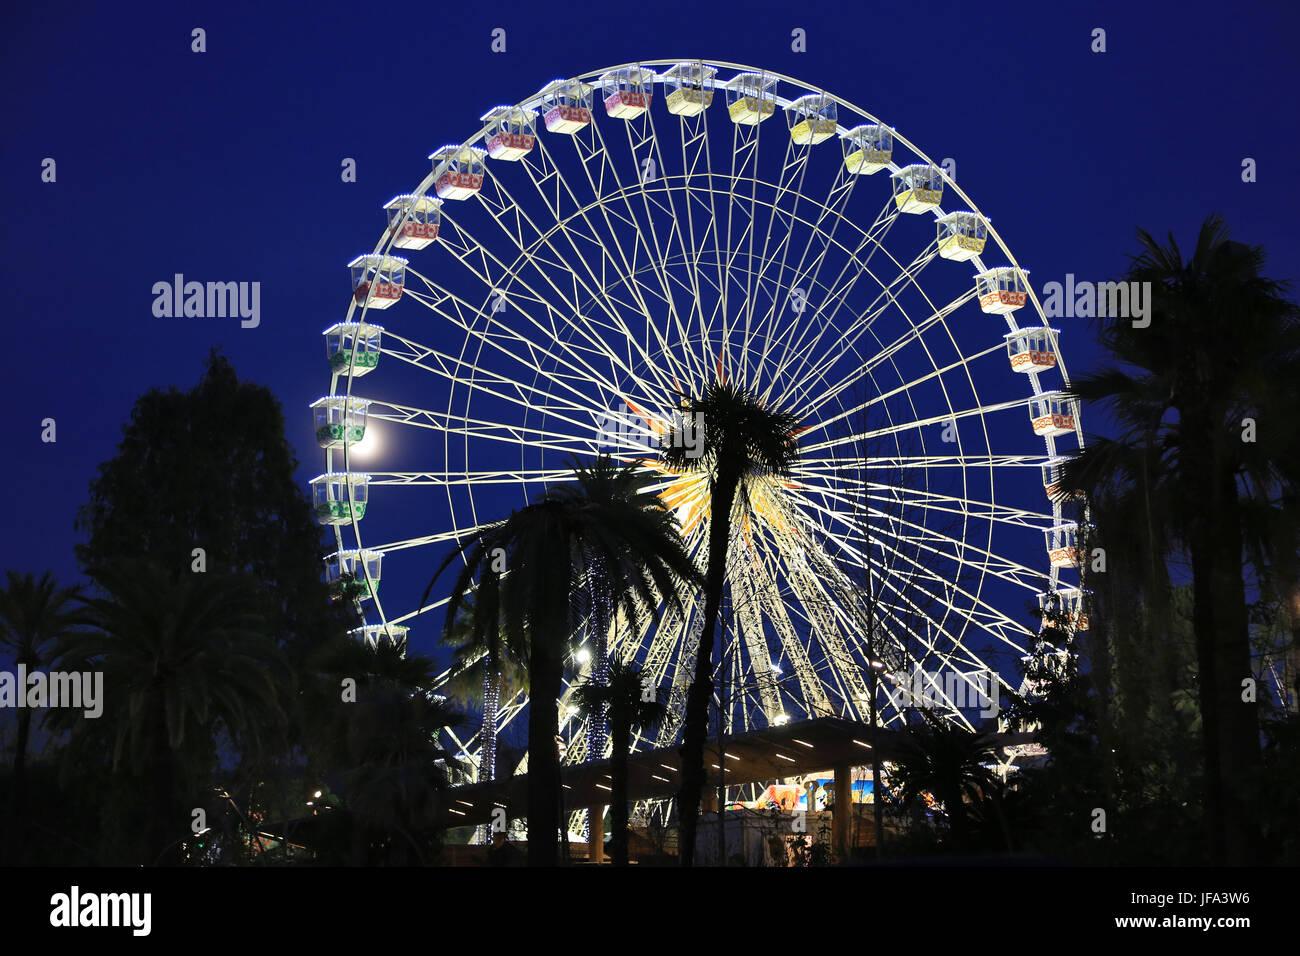 Ferris wheel in Nice at night - Stock Image